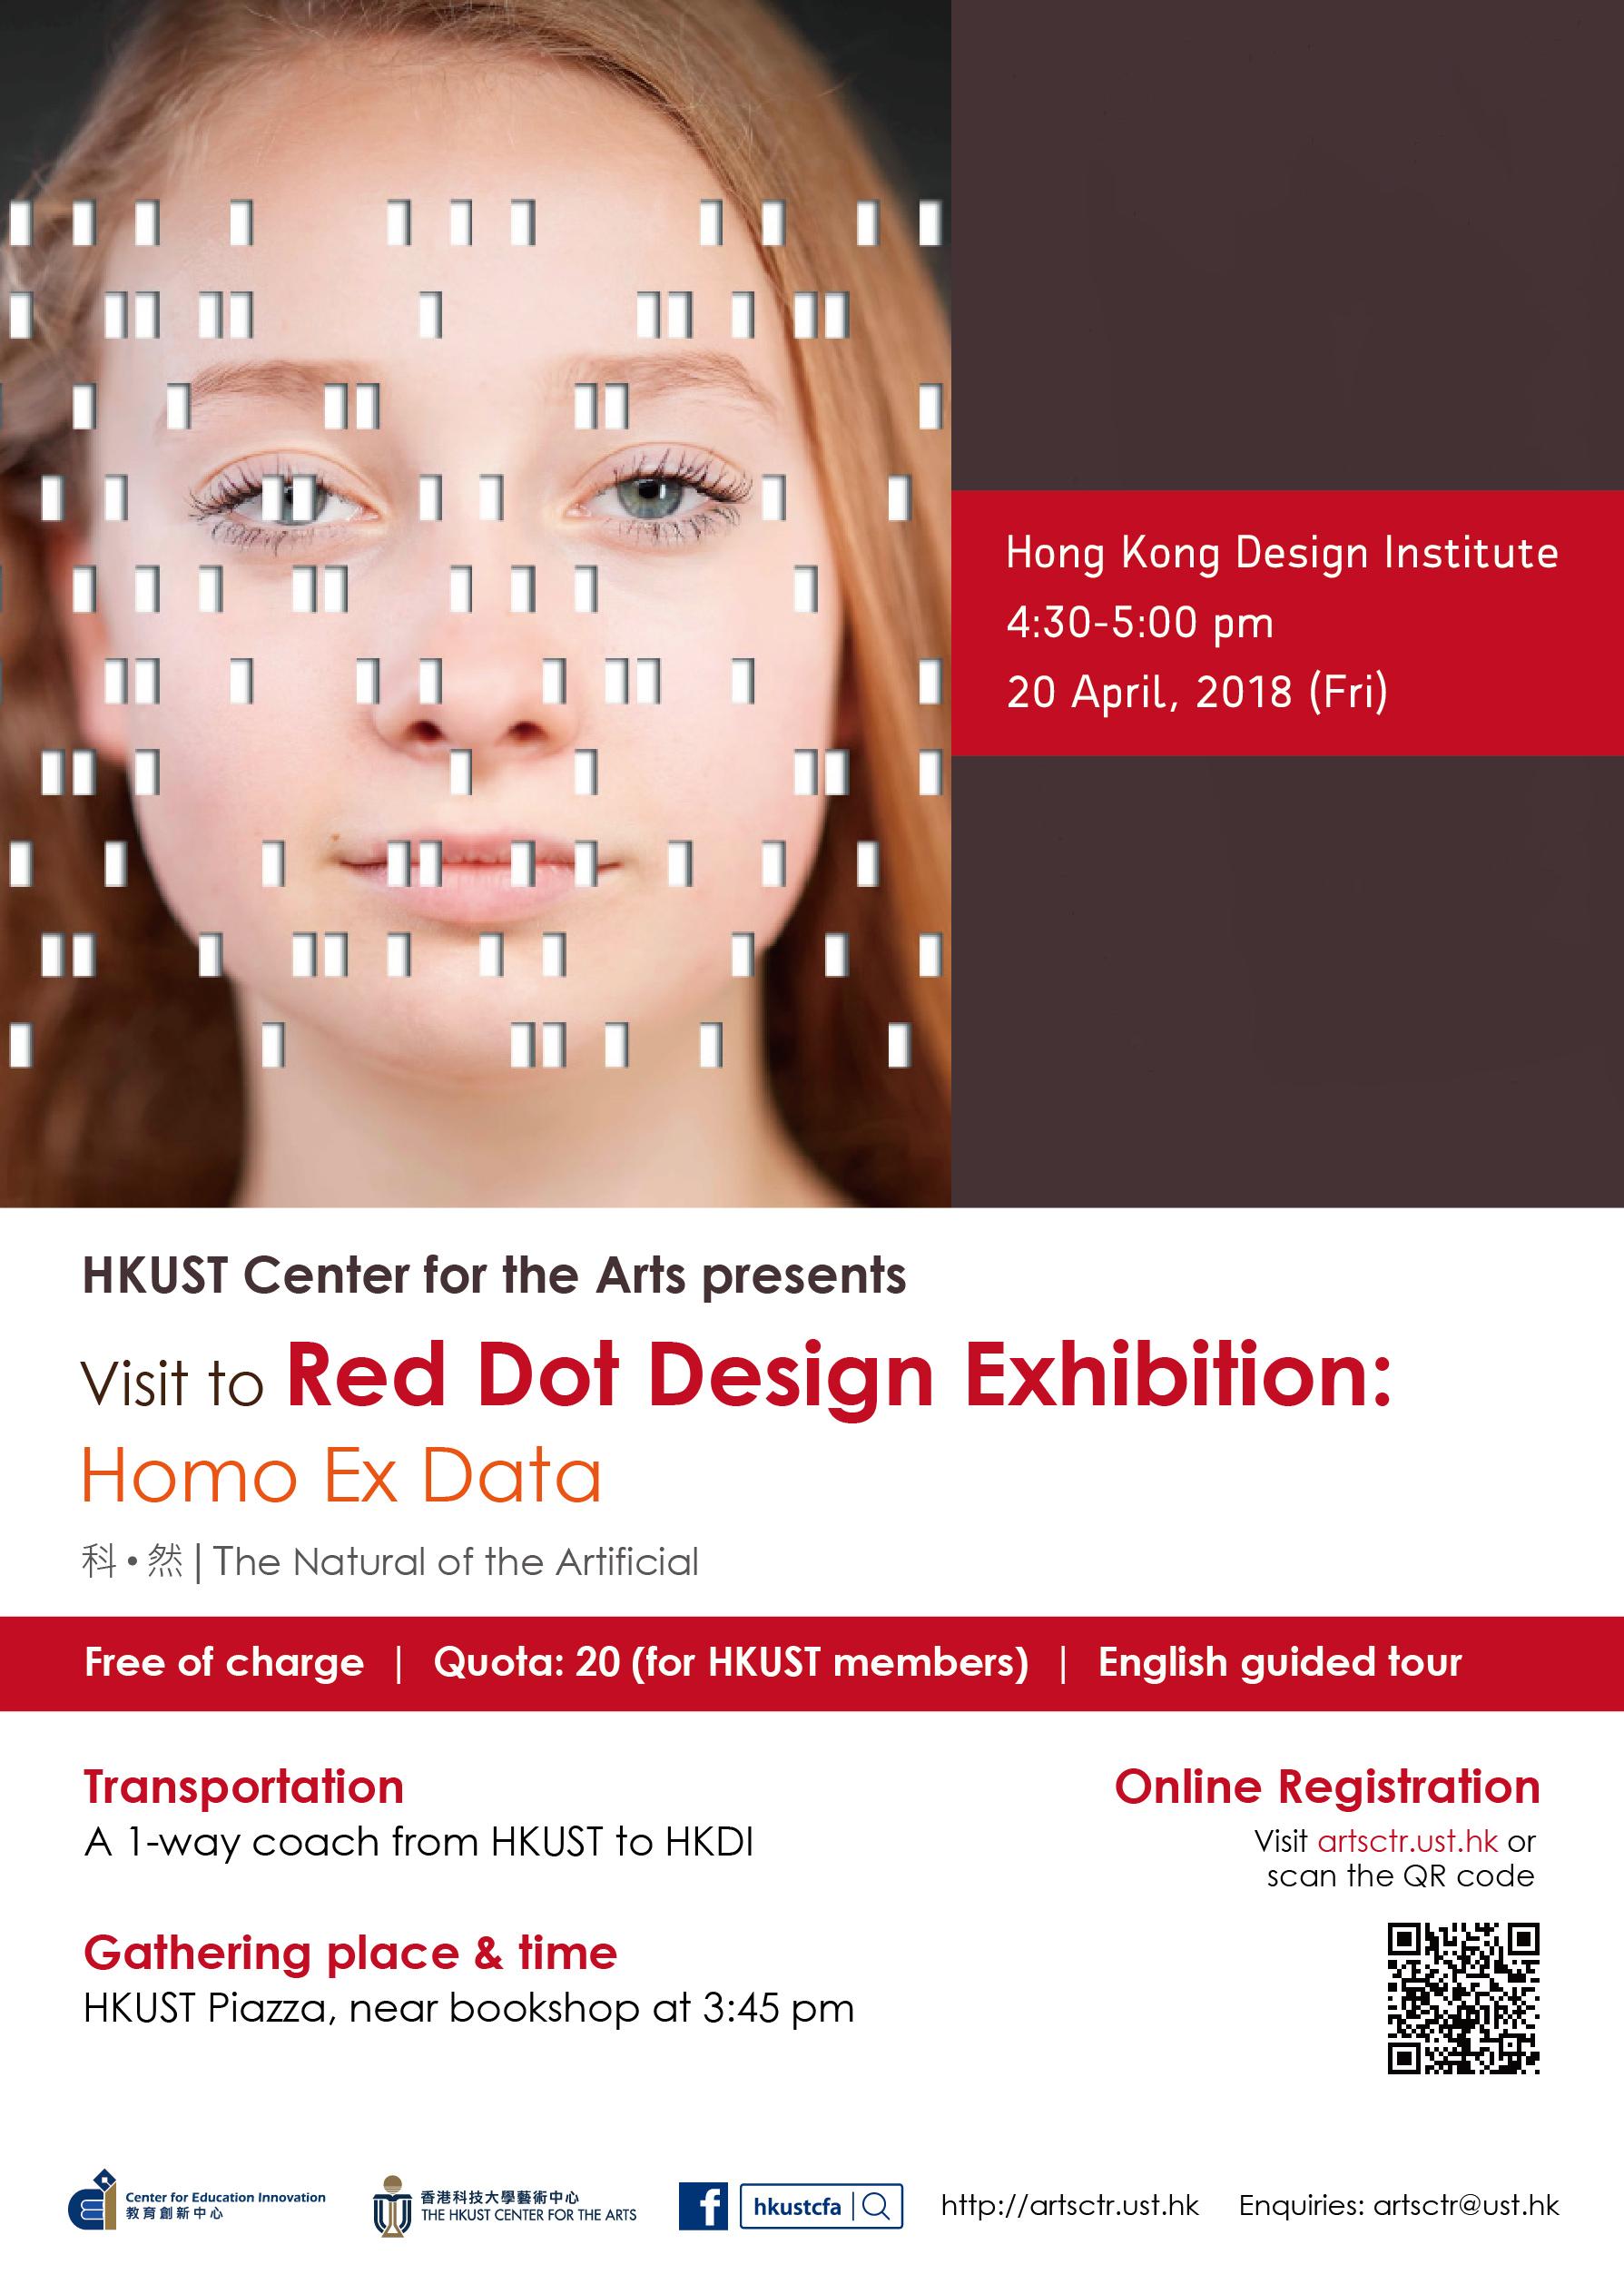 Visit to Red Dot Design Exhibition: Homo Ex Data  Apr 20, 2018